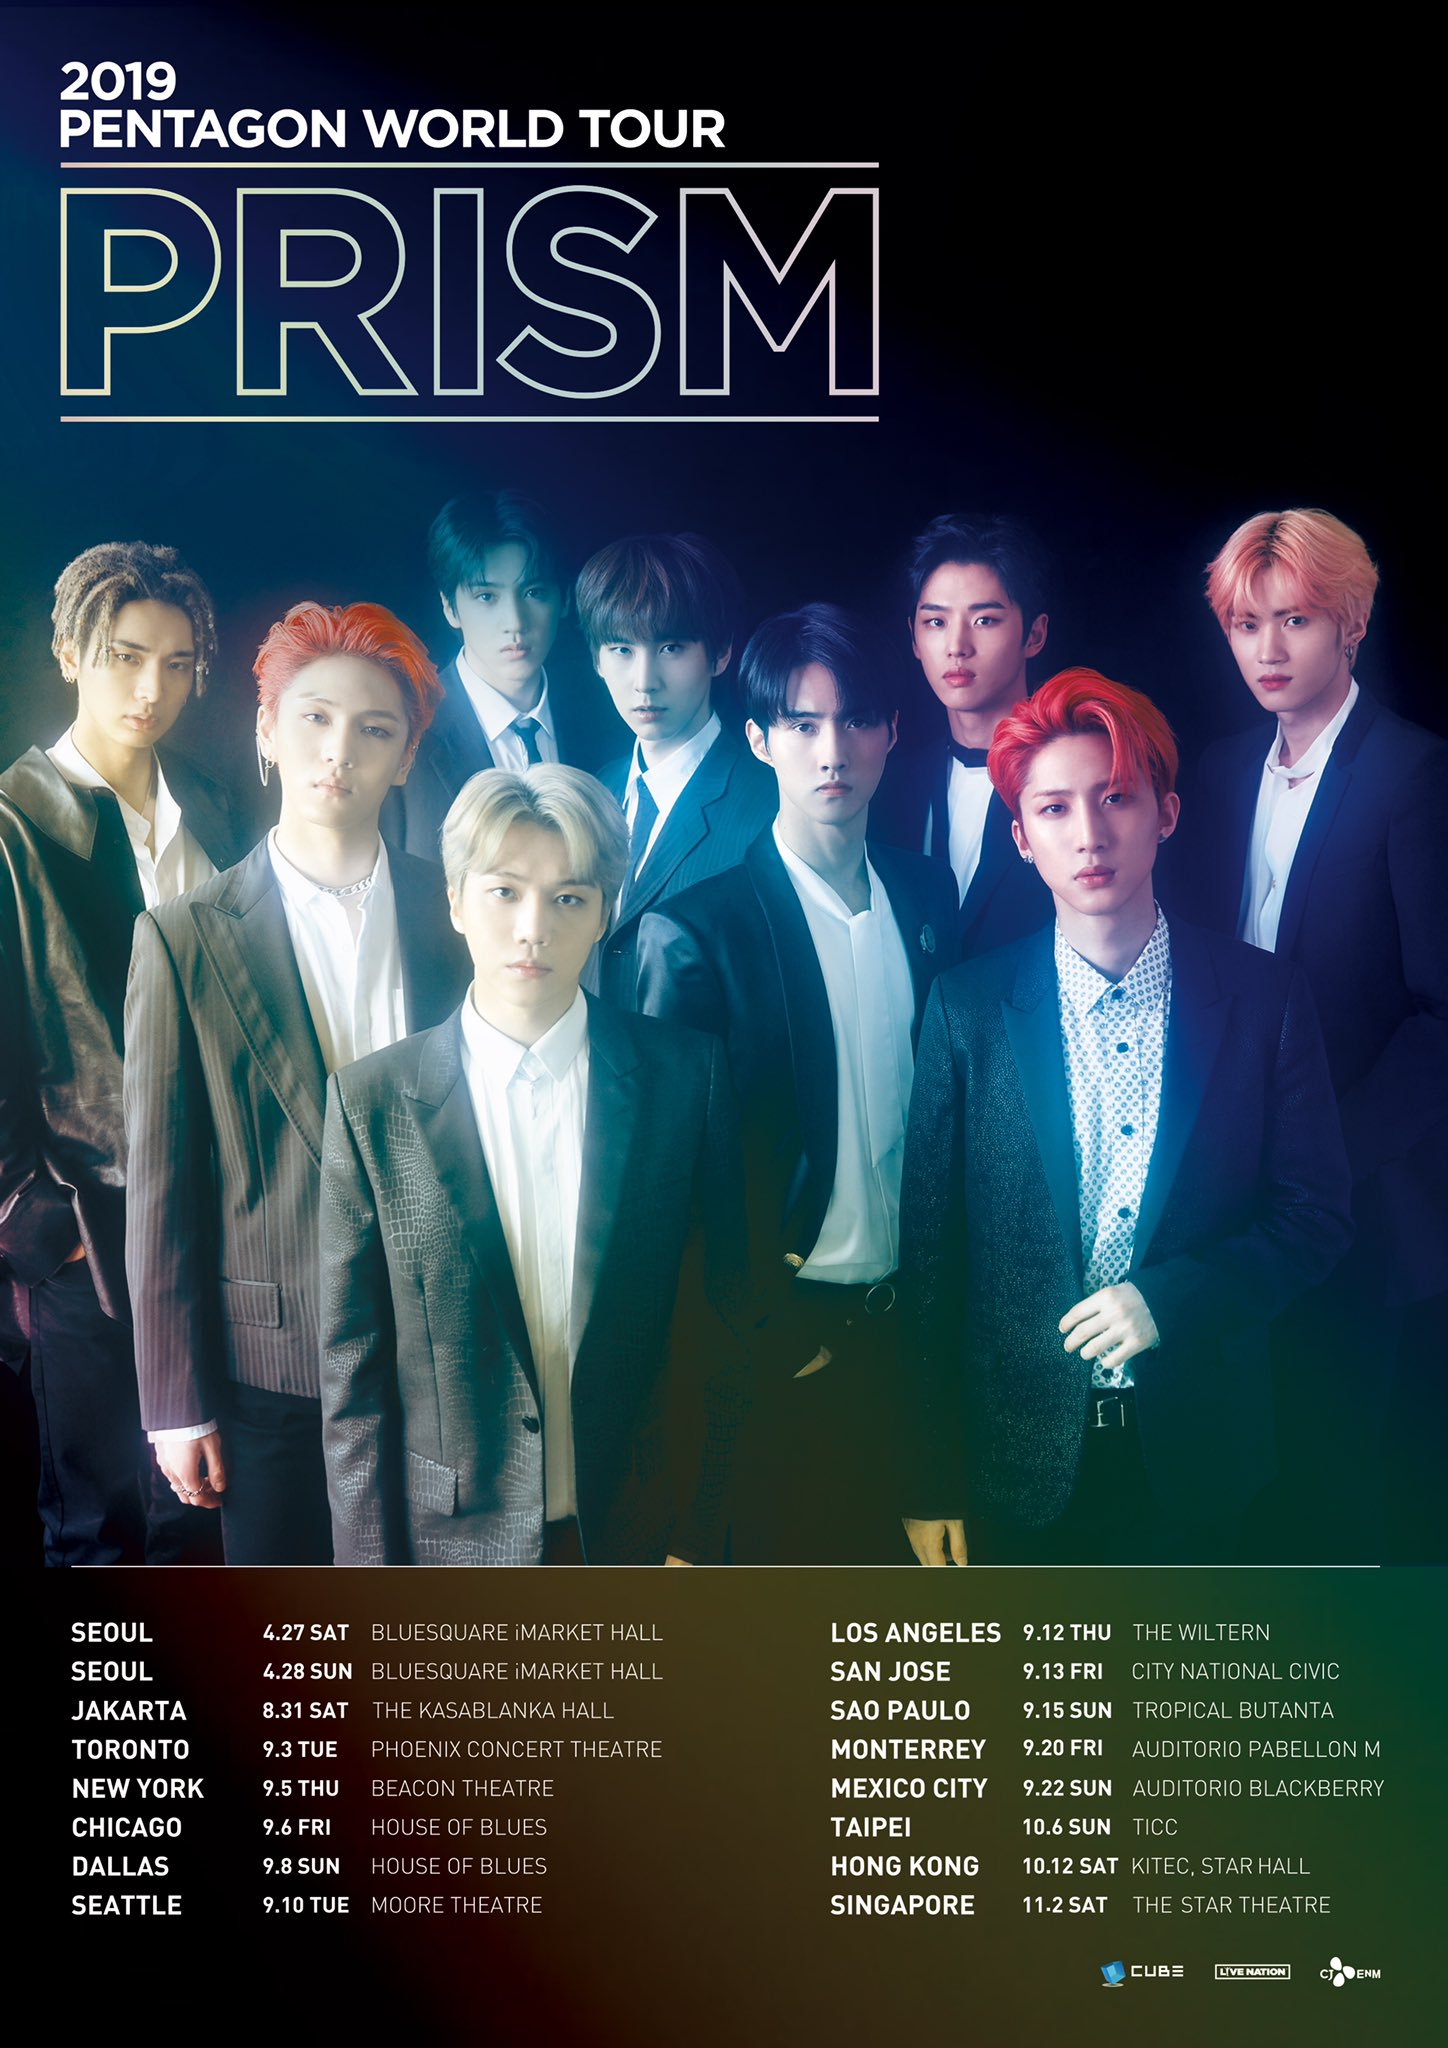 pentagon, pentagon world tour, pentagon 2019, pentagon profile, pentagon leader, pentagon age, pentagon height, pentagon maknae, pentagon prism